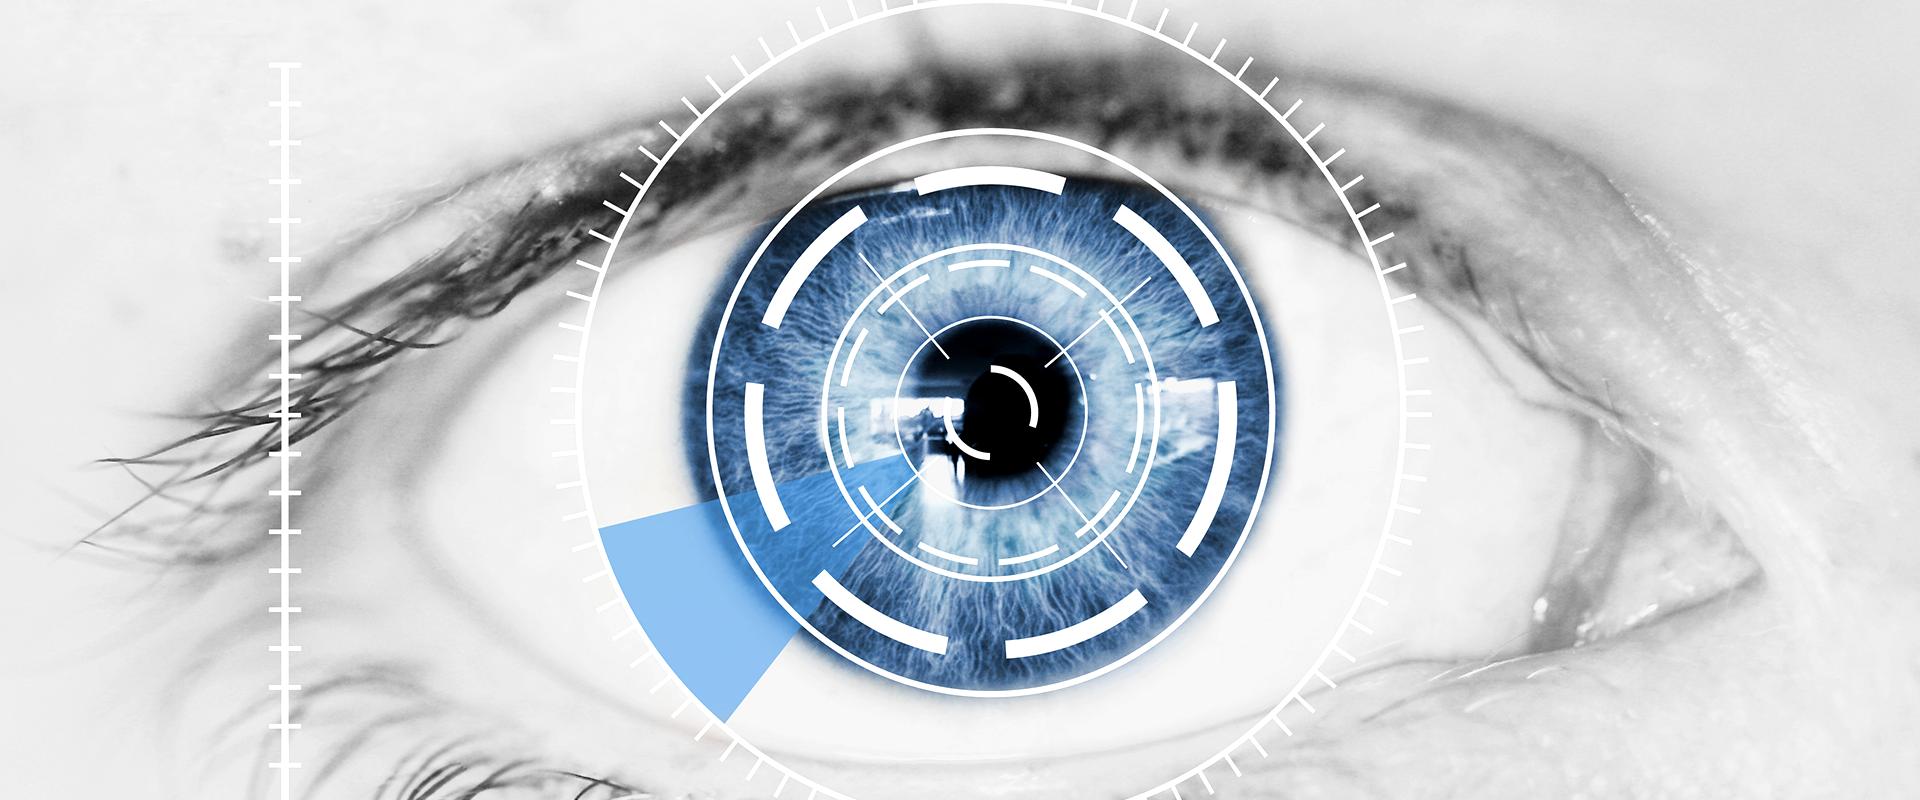 iris-recognition-noncontact-identification